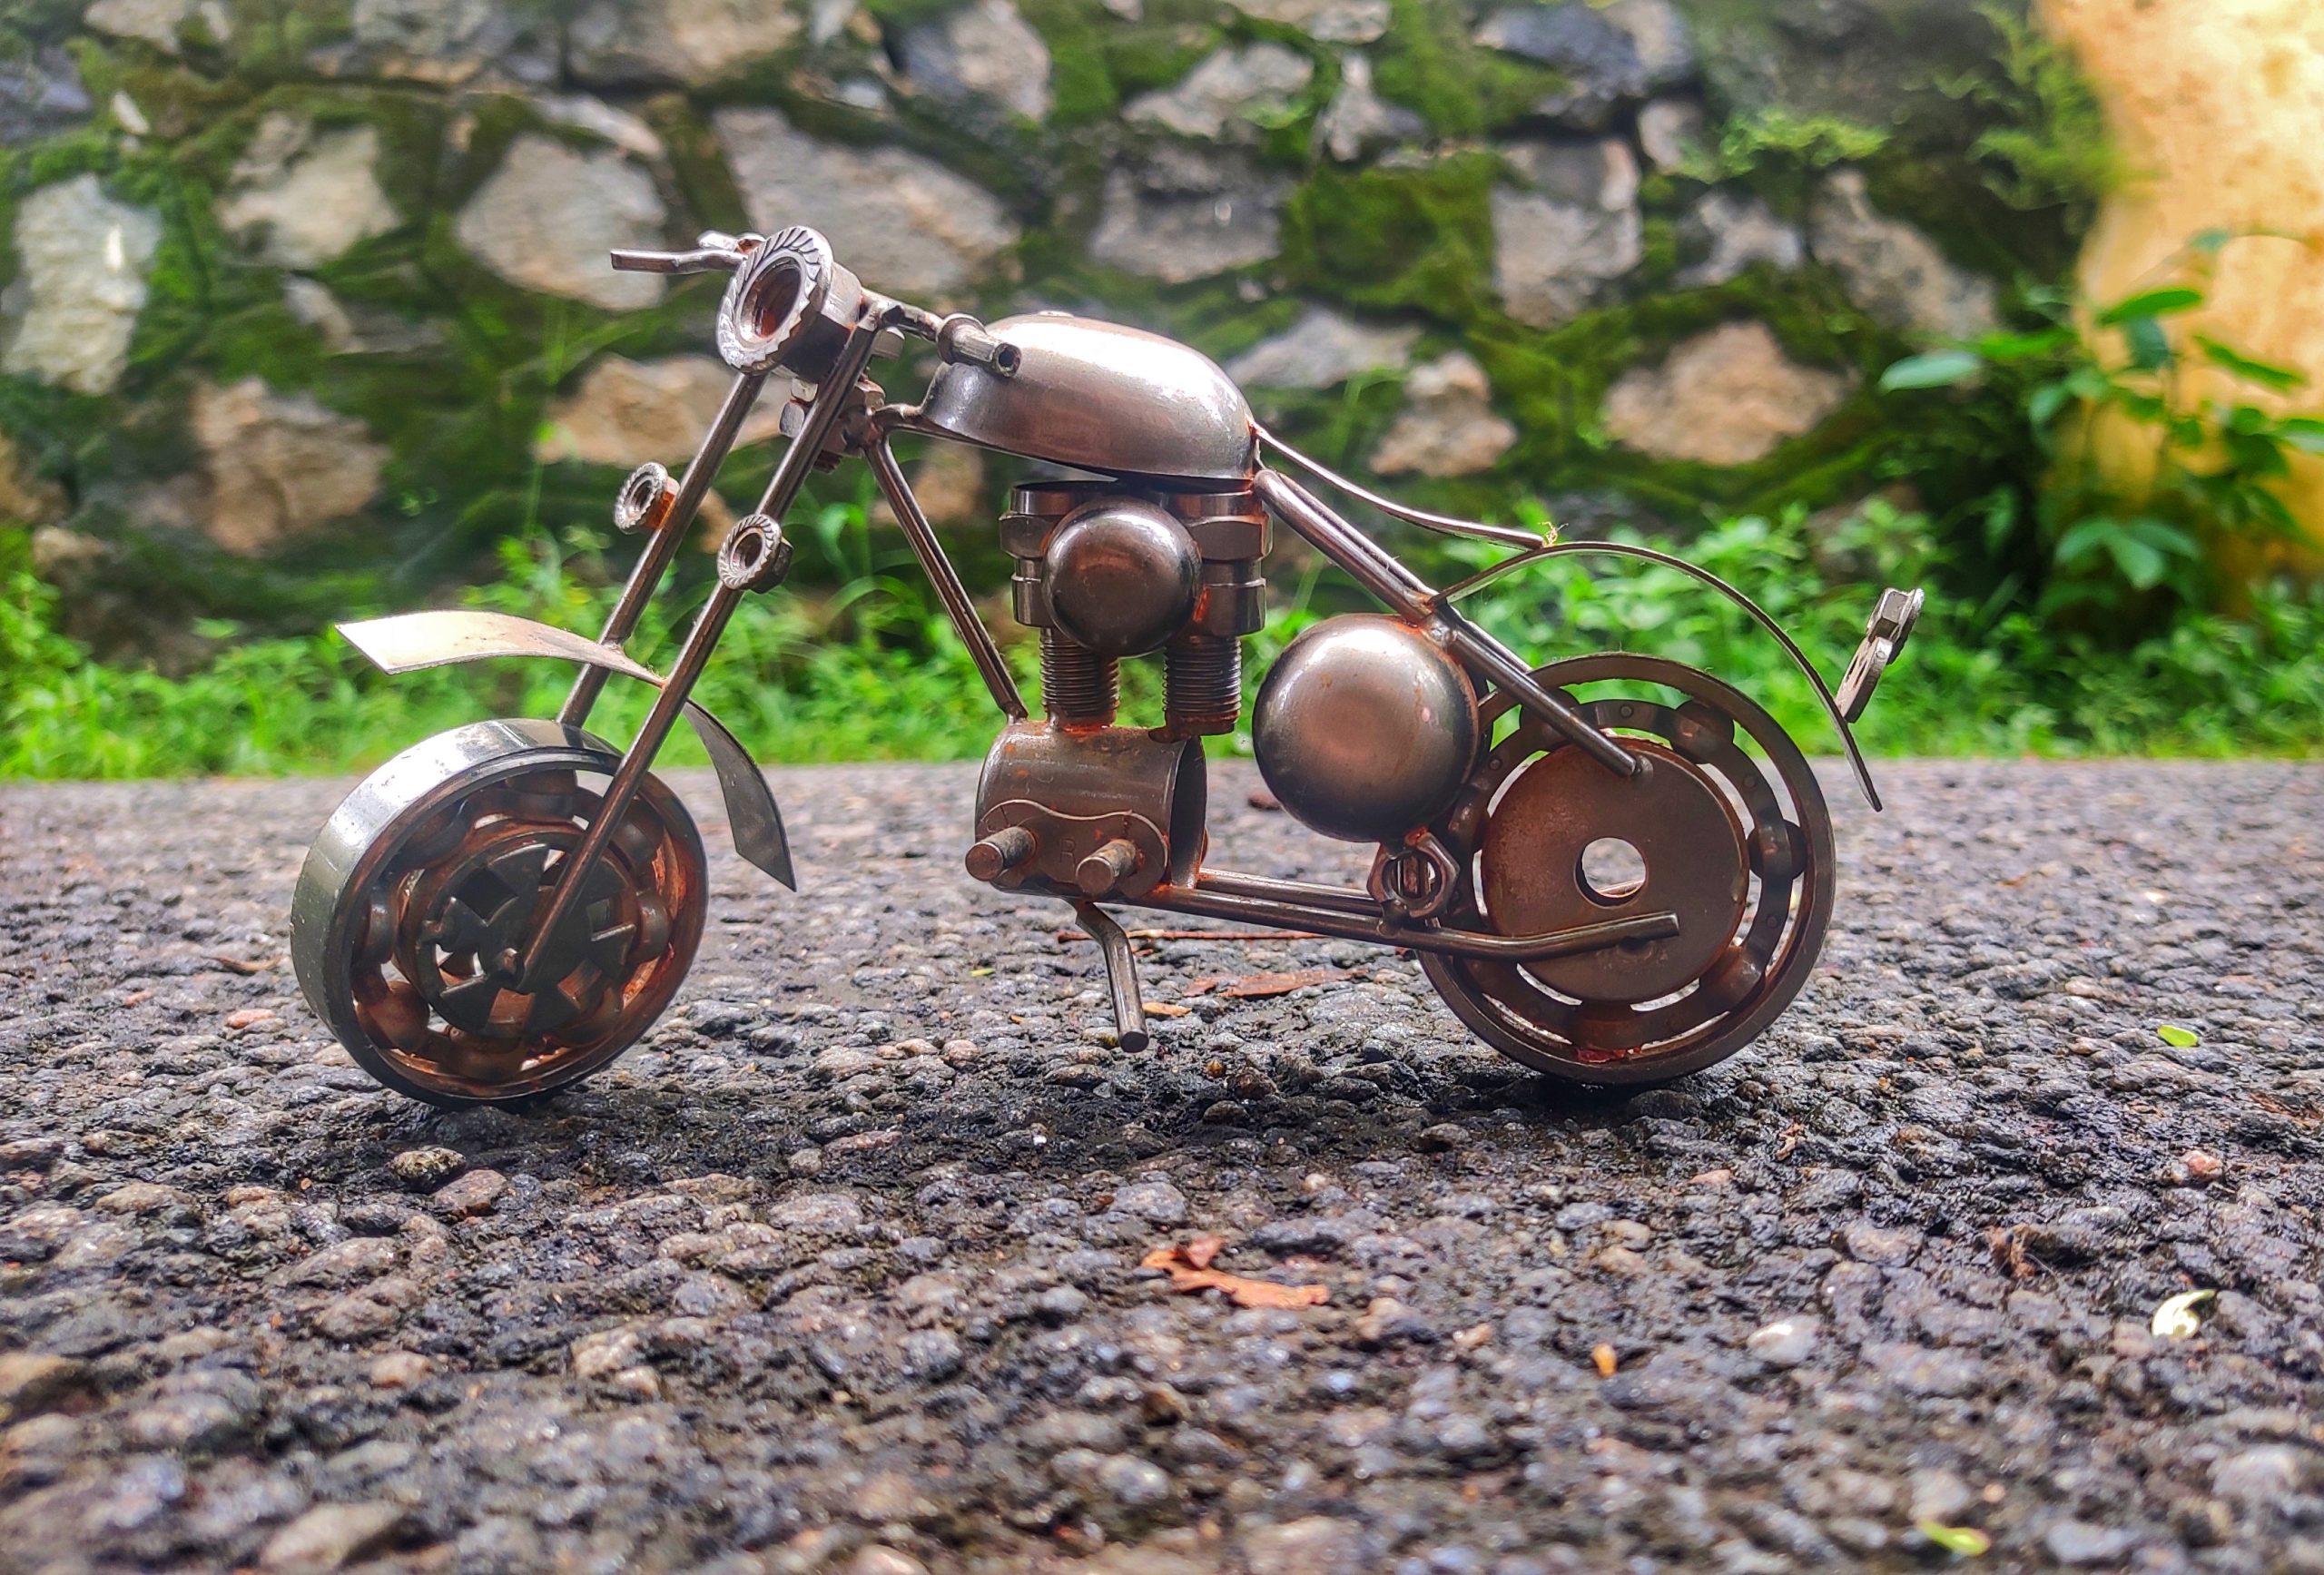 A miniature of moto bike